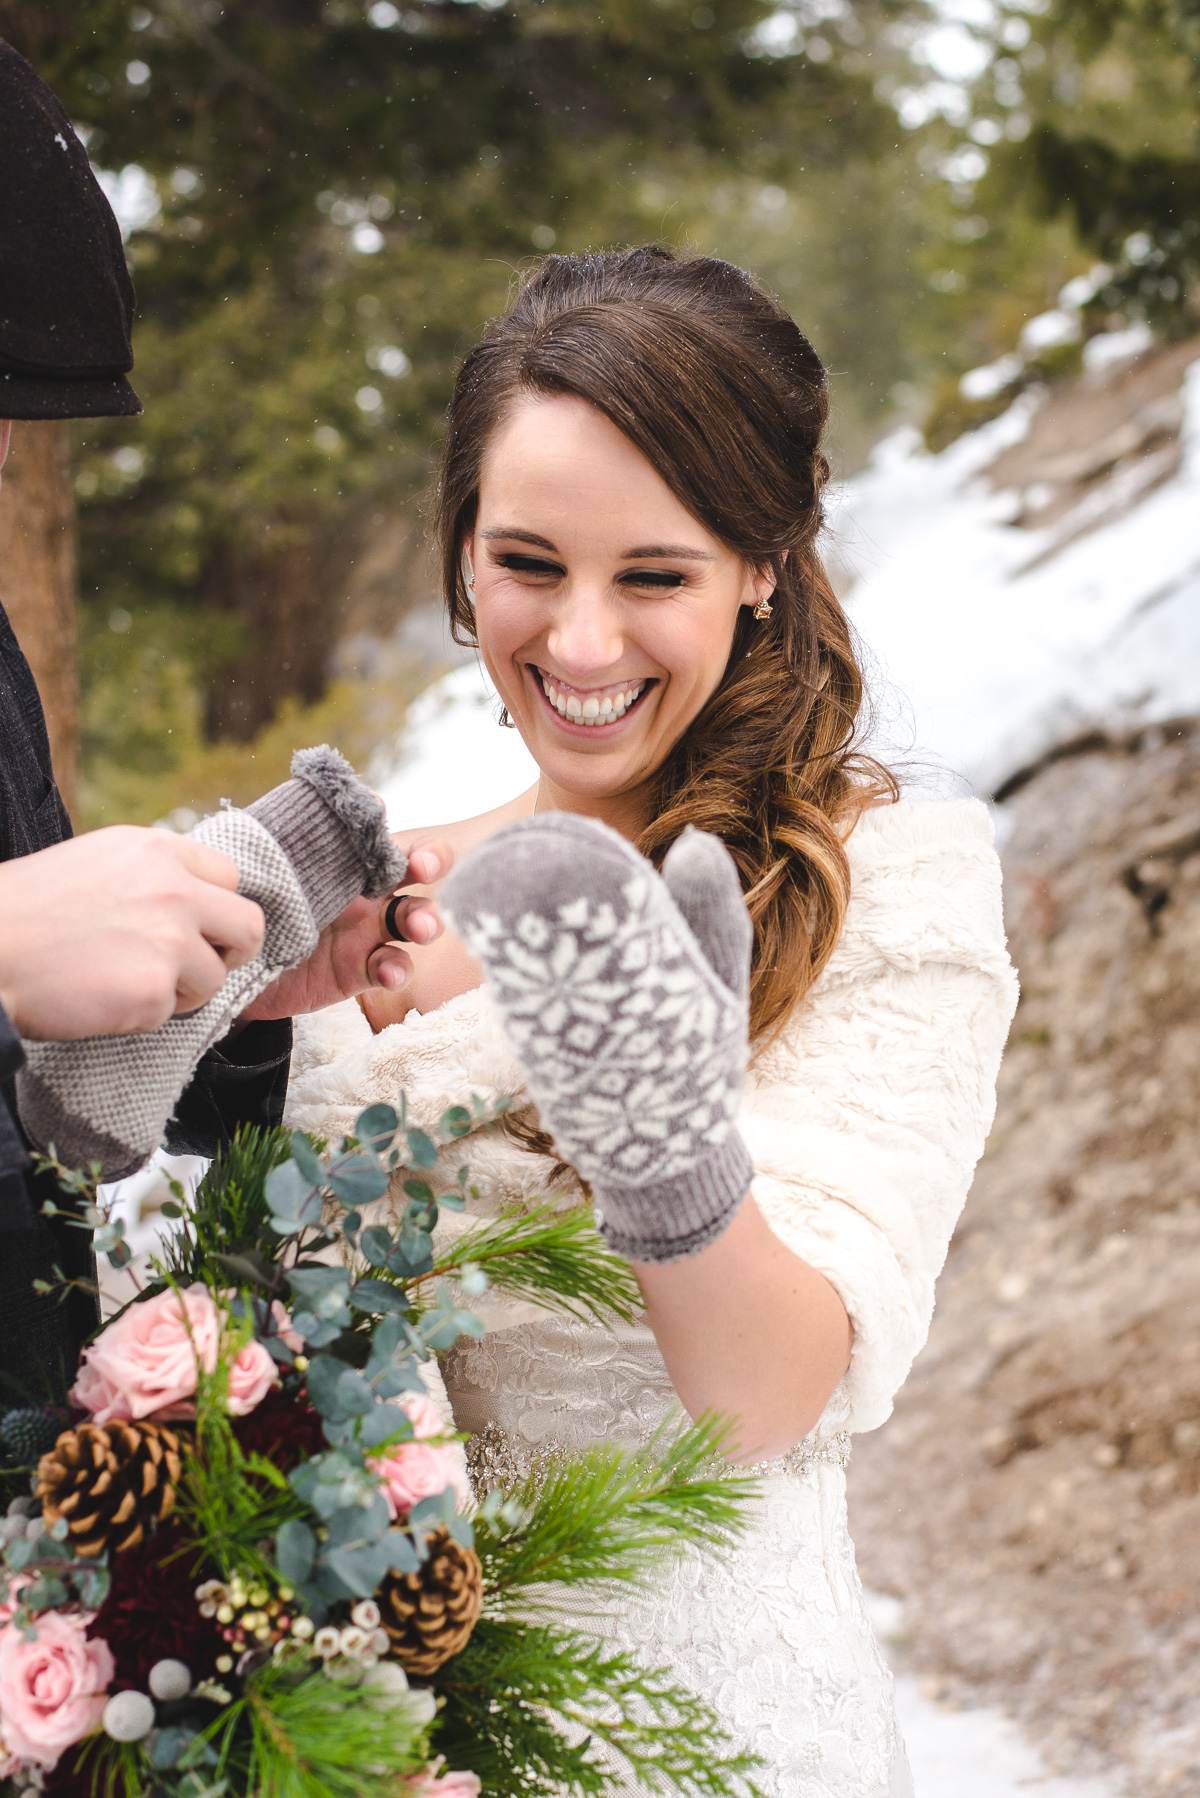 Winter.Elope.Wedding.February-10.jpg